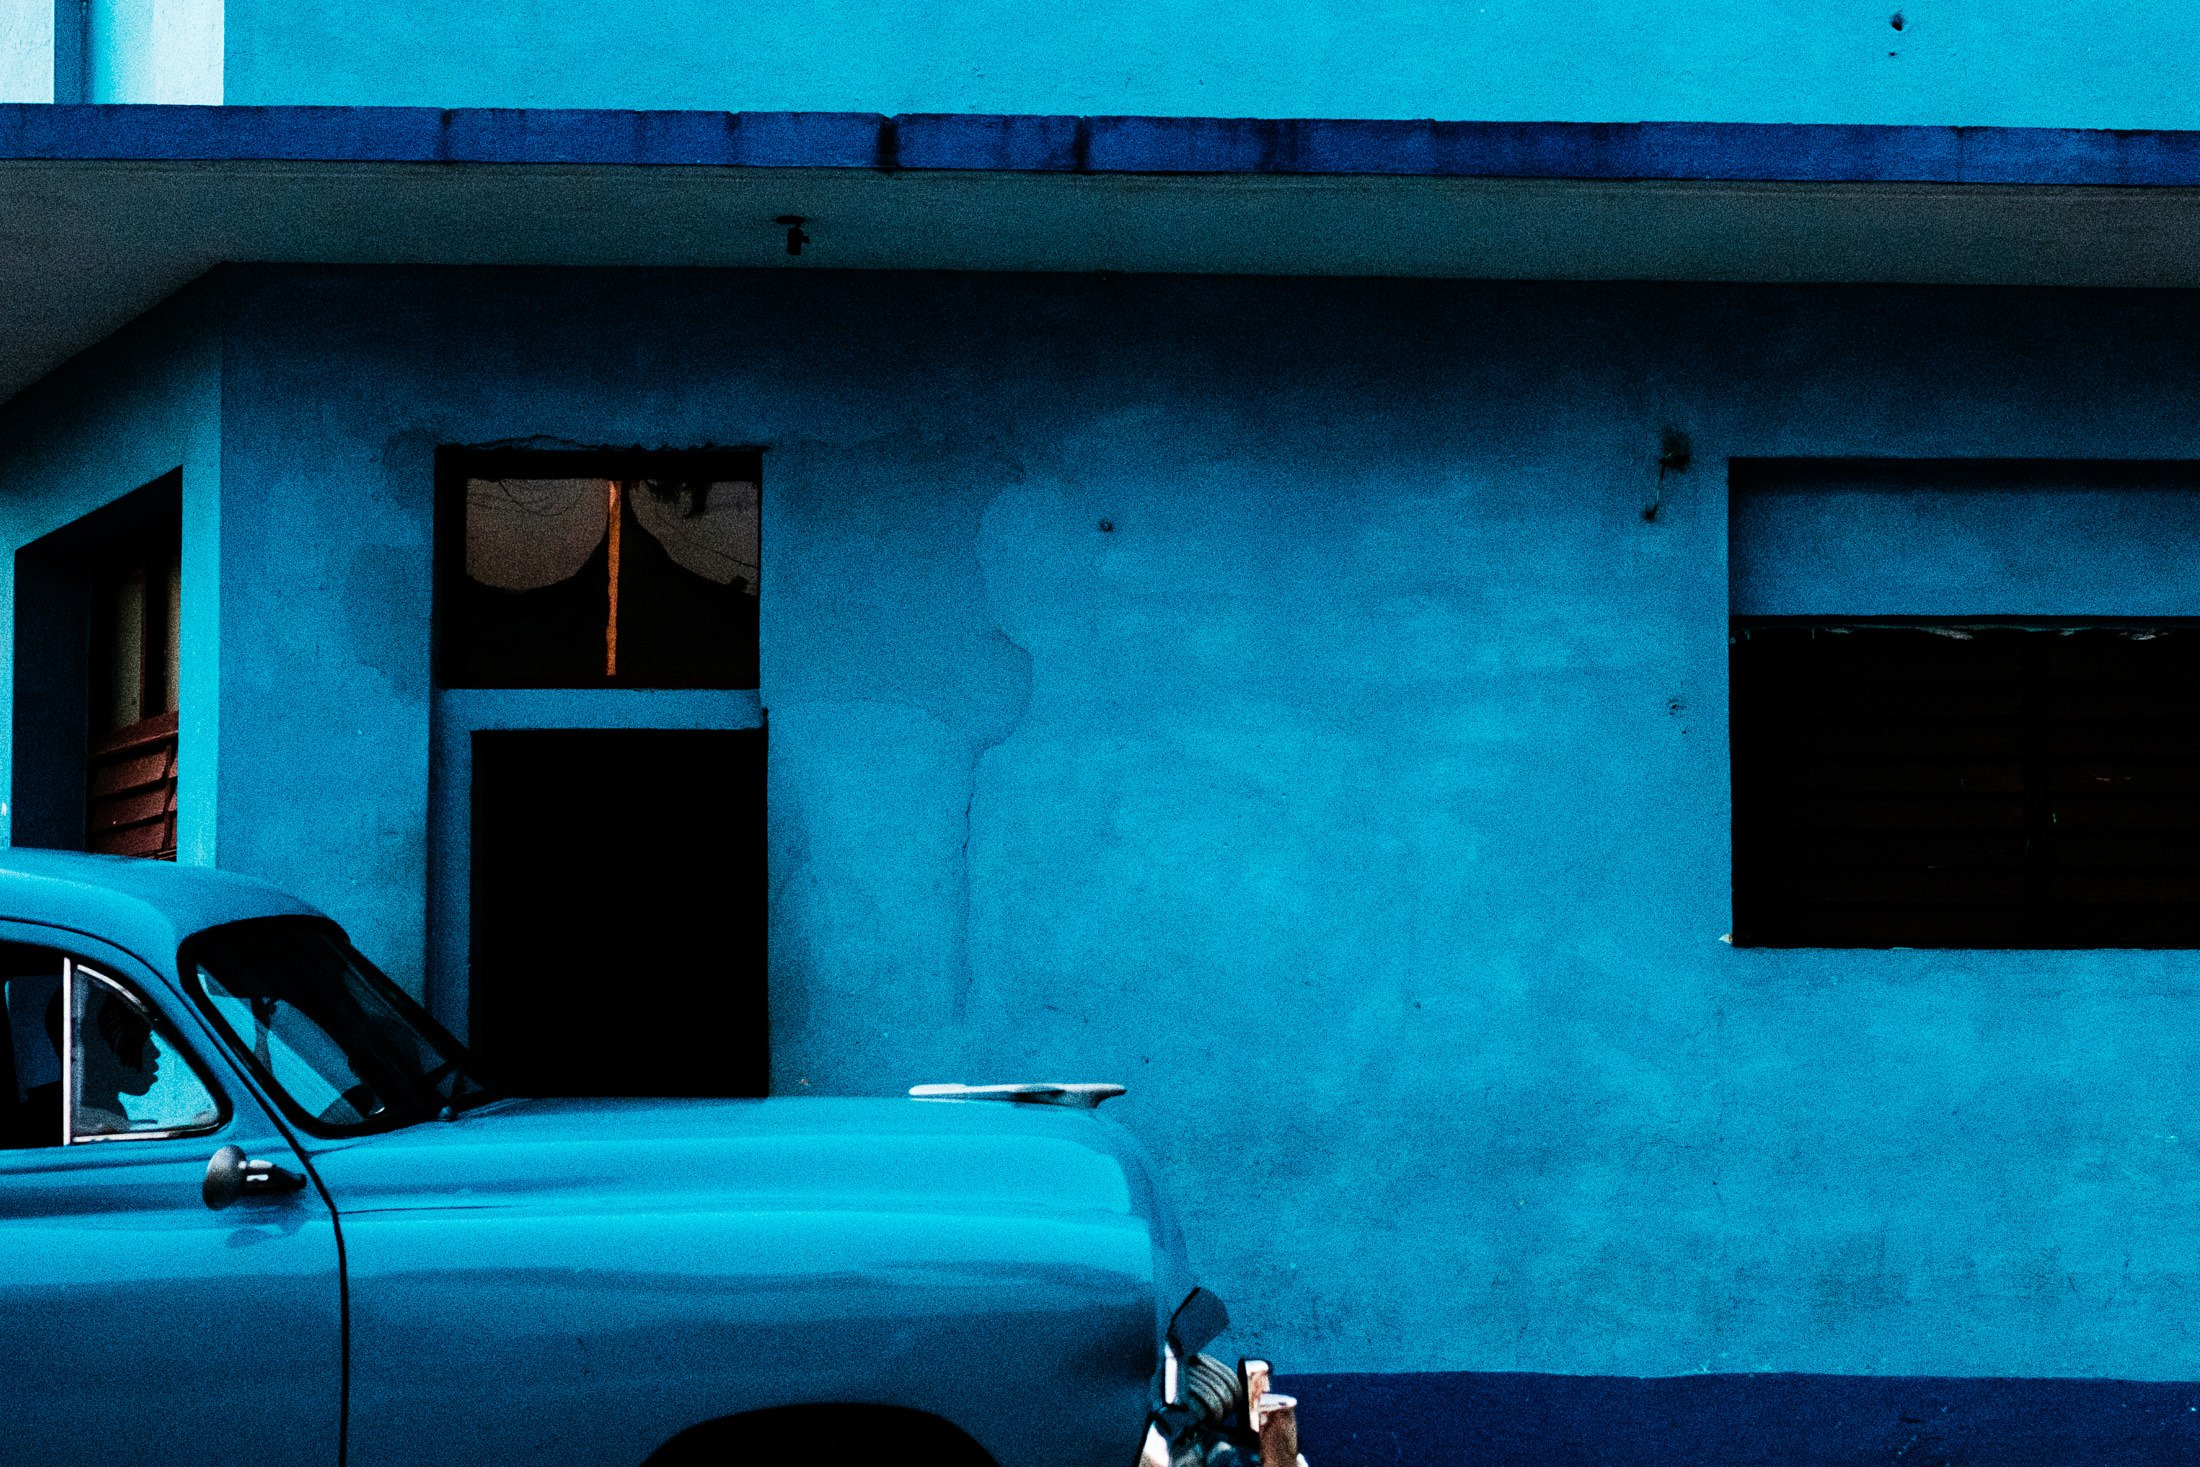 a man sat in a blue car next to a blue wall